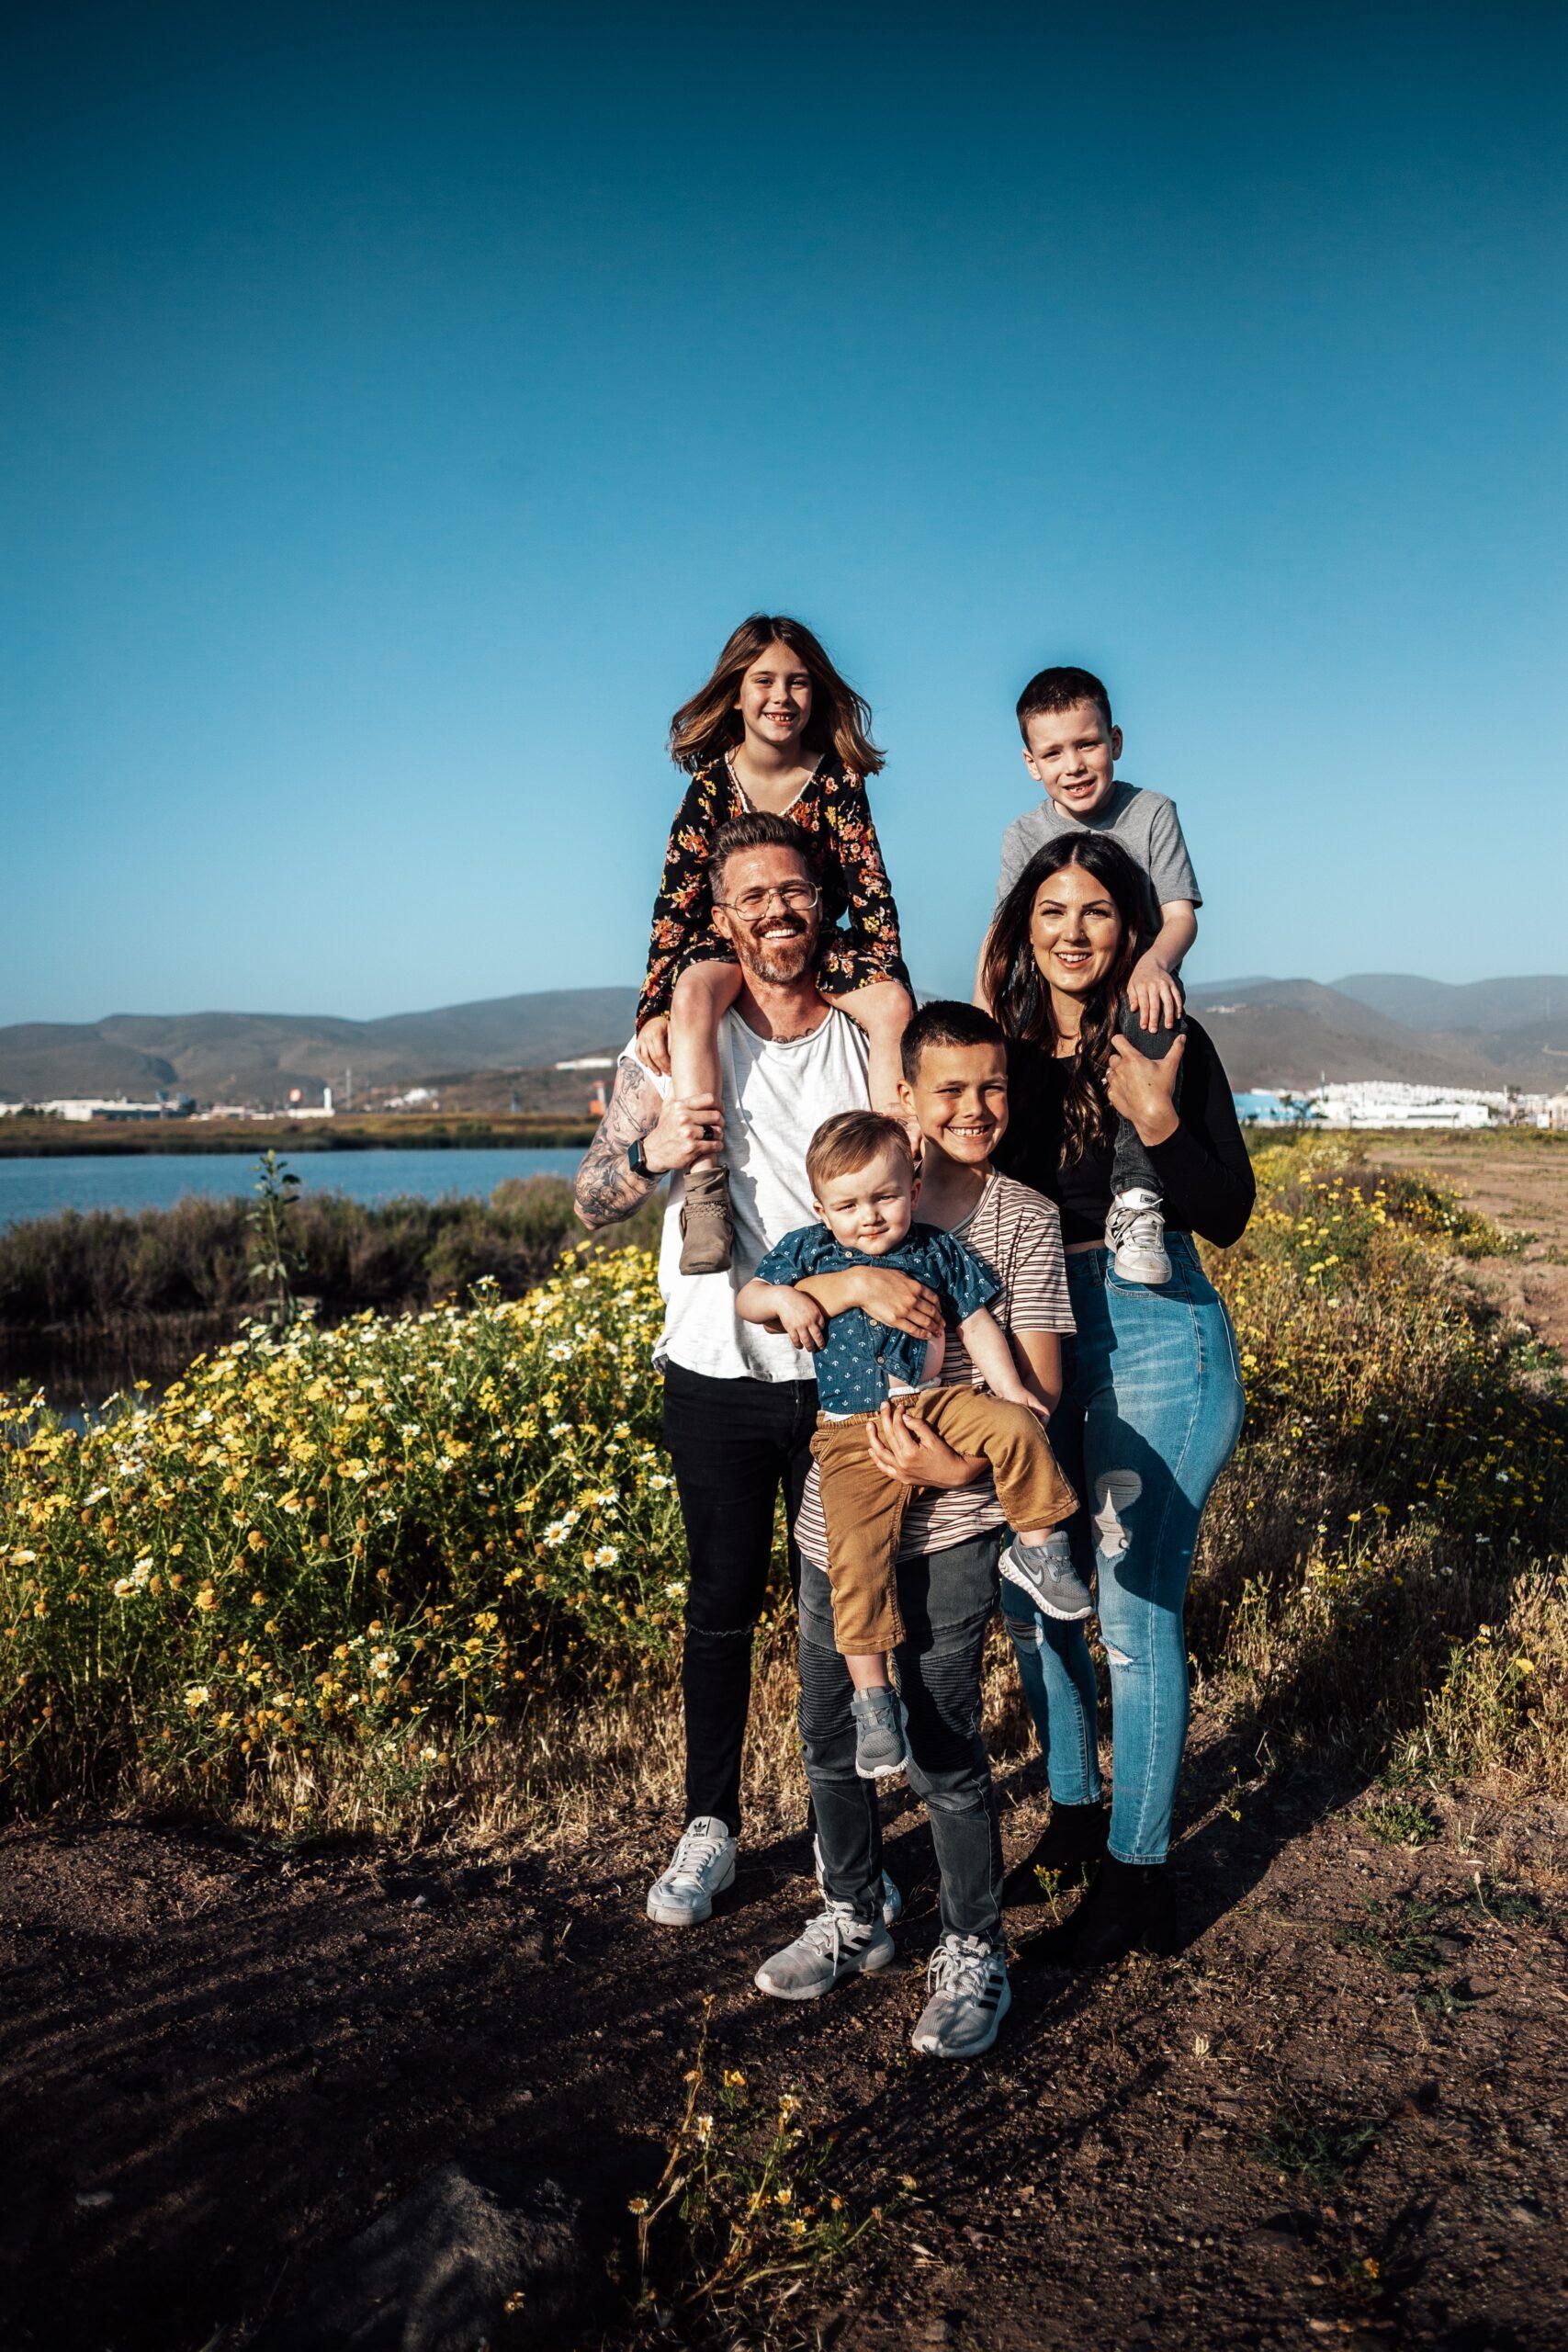 Episode 14: Ποιός είναι ο ρόλος της οικογένειας στις πανελλήνιες εξετάσεις;